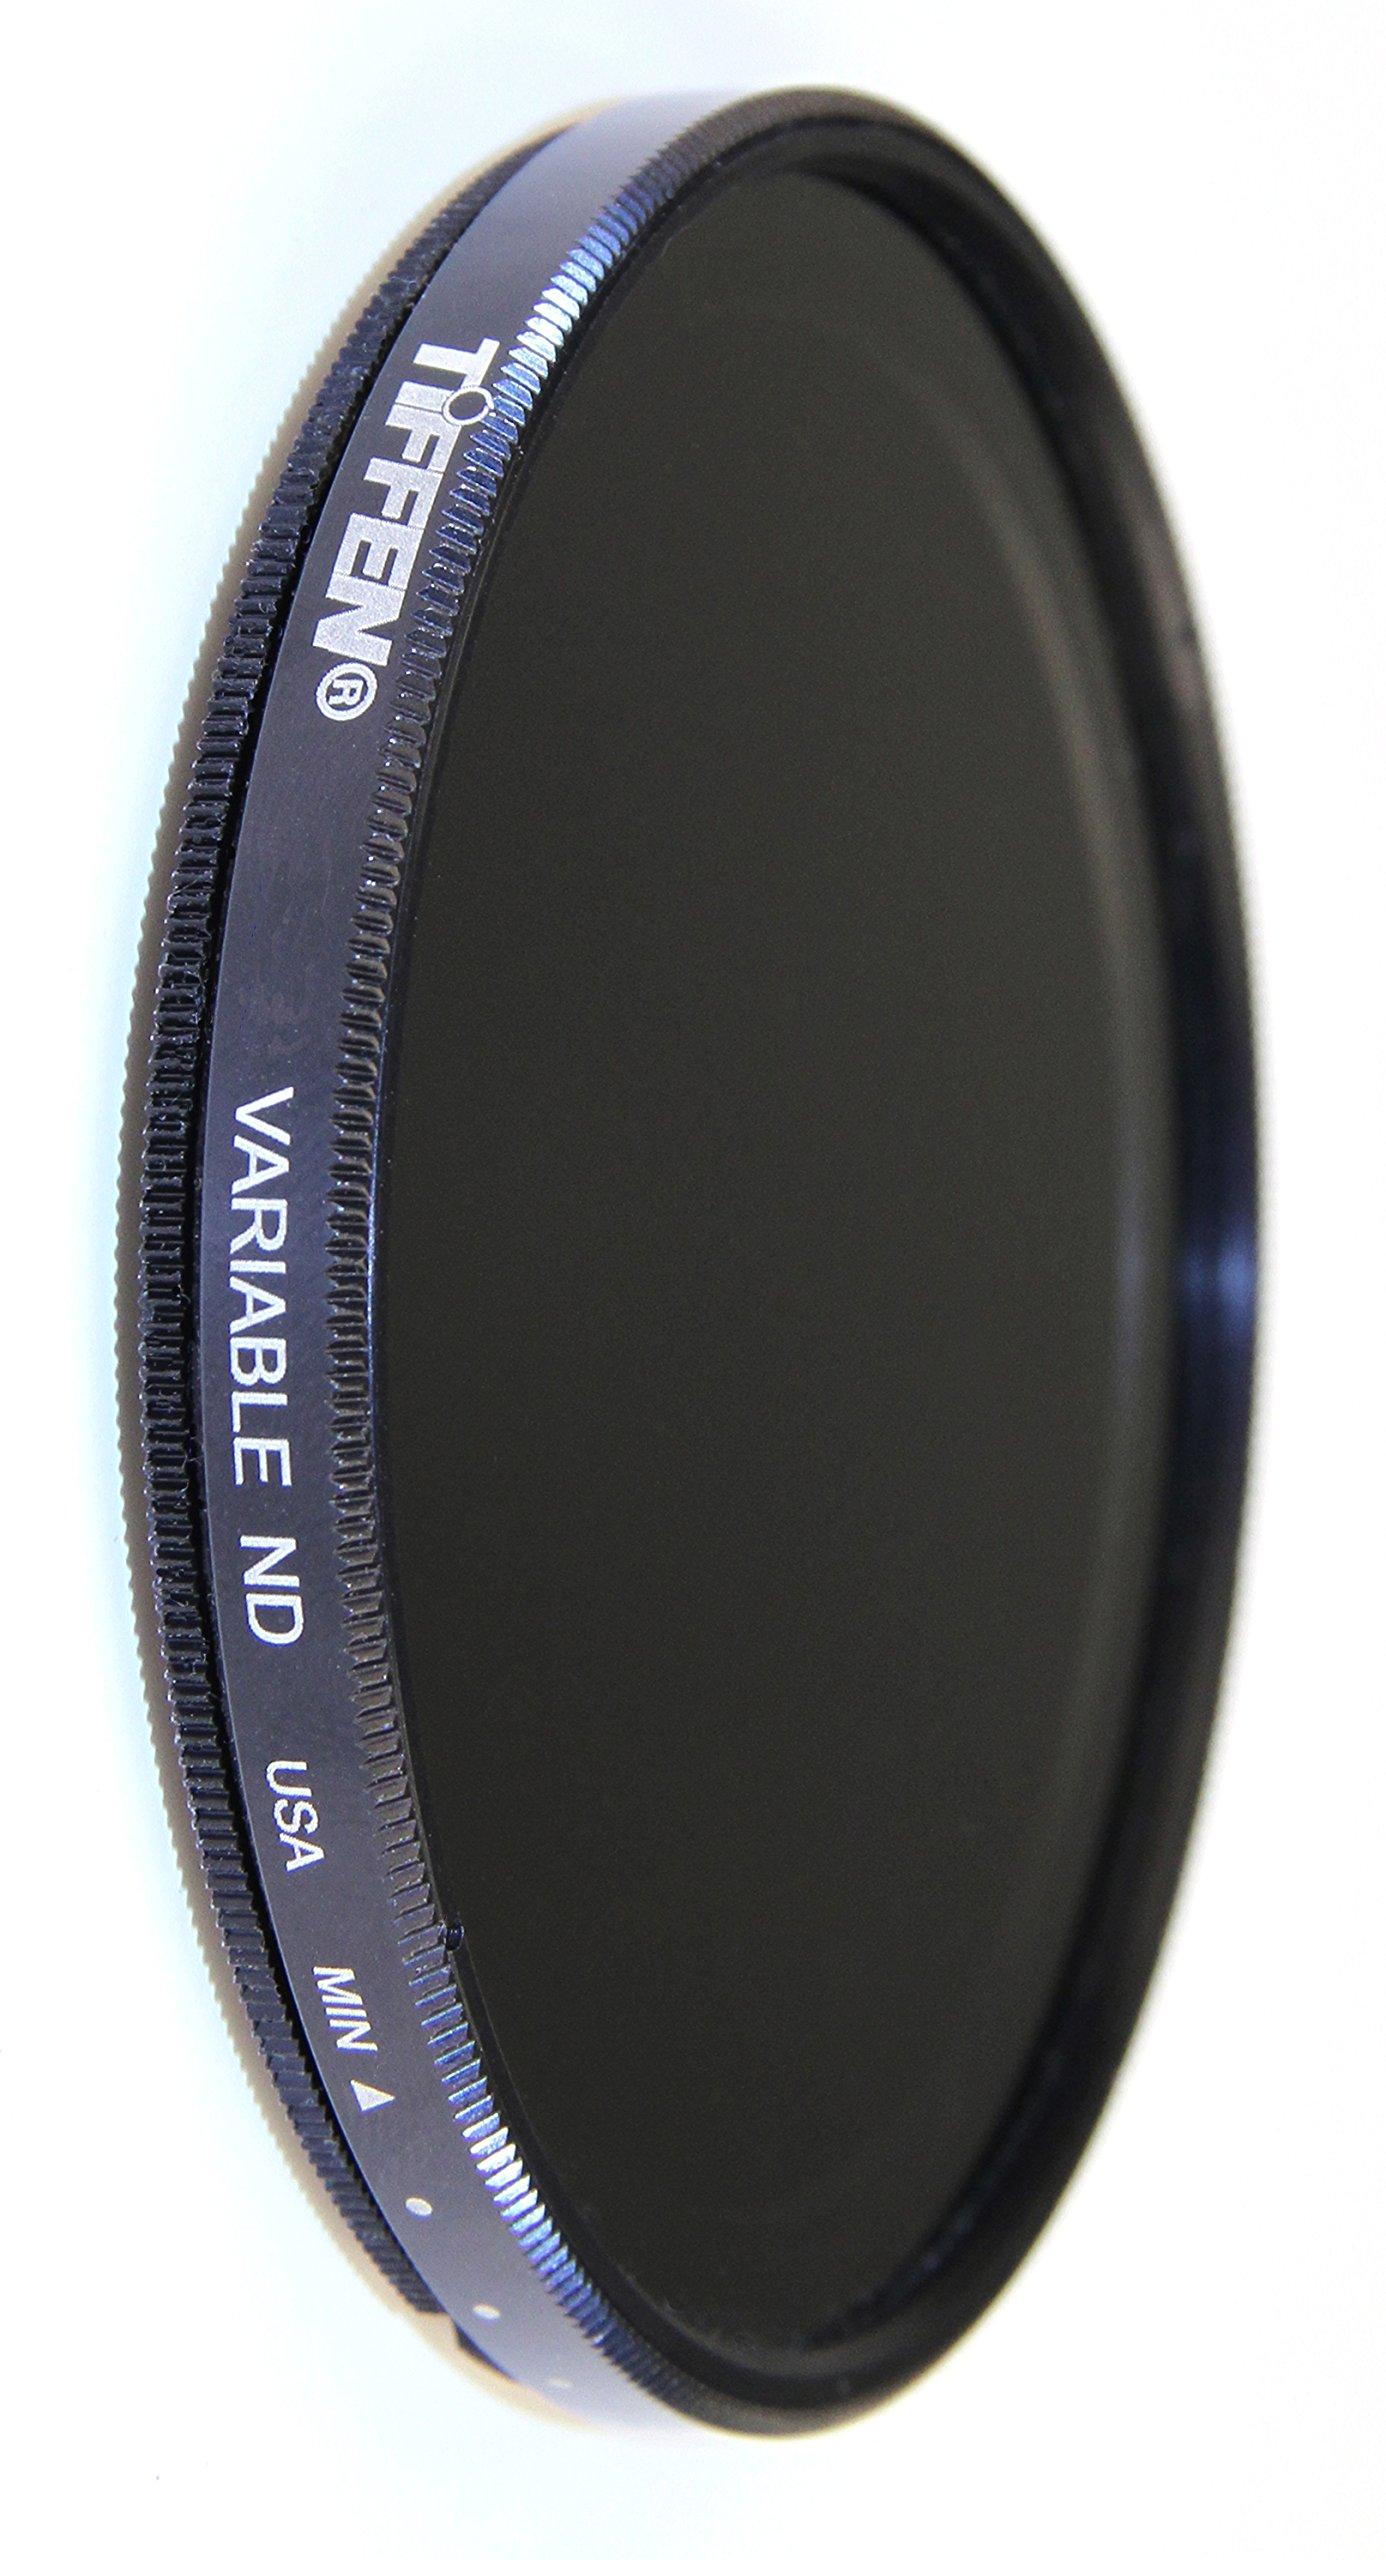 Tiffen 77mm Variable Neutral Density Filter 77VND for Camera lenses by Tiffen